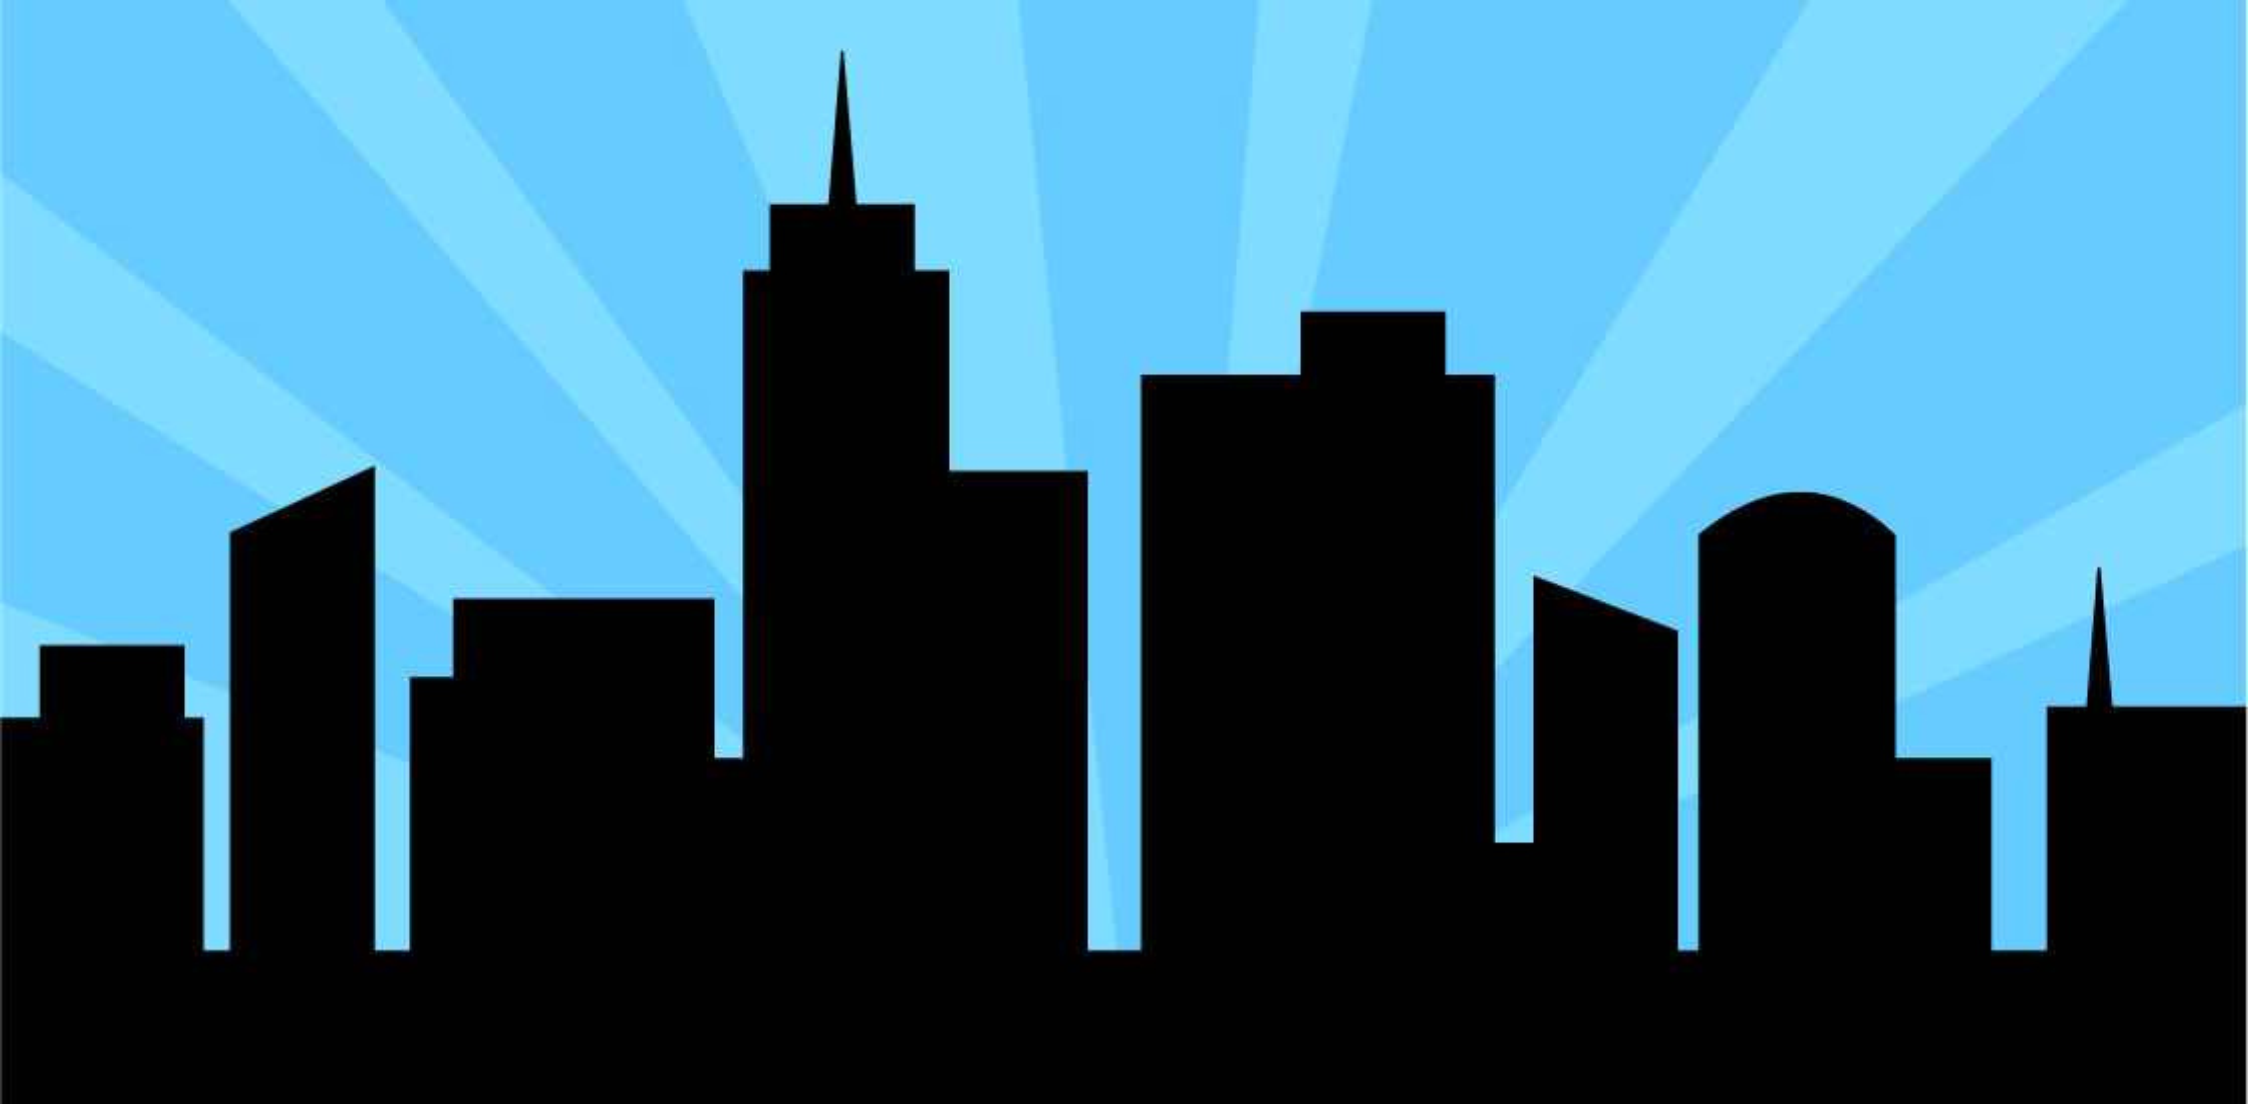 Cityscape | Club Penguin Wiki | Fandom powered by Wikia